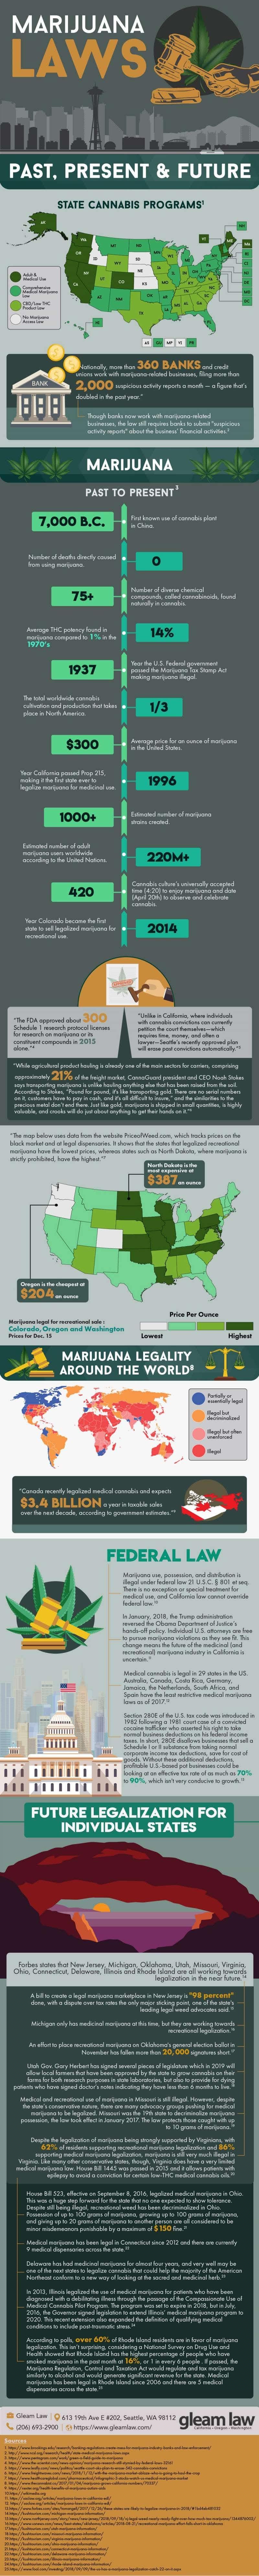 Marijuana Laws Past, Present & Future #infographic